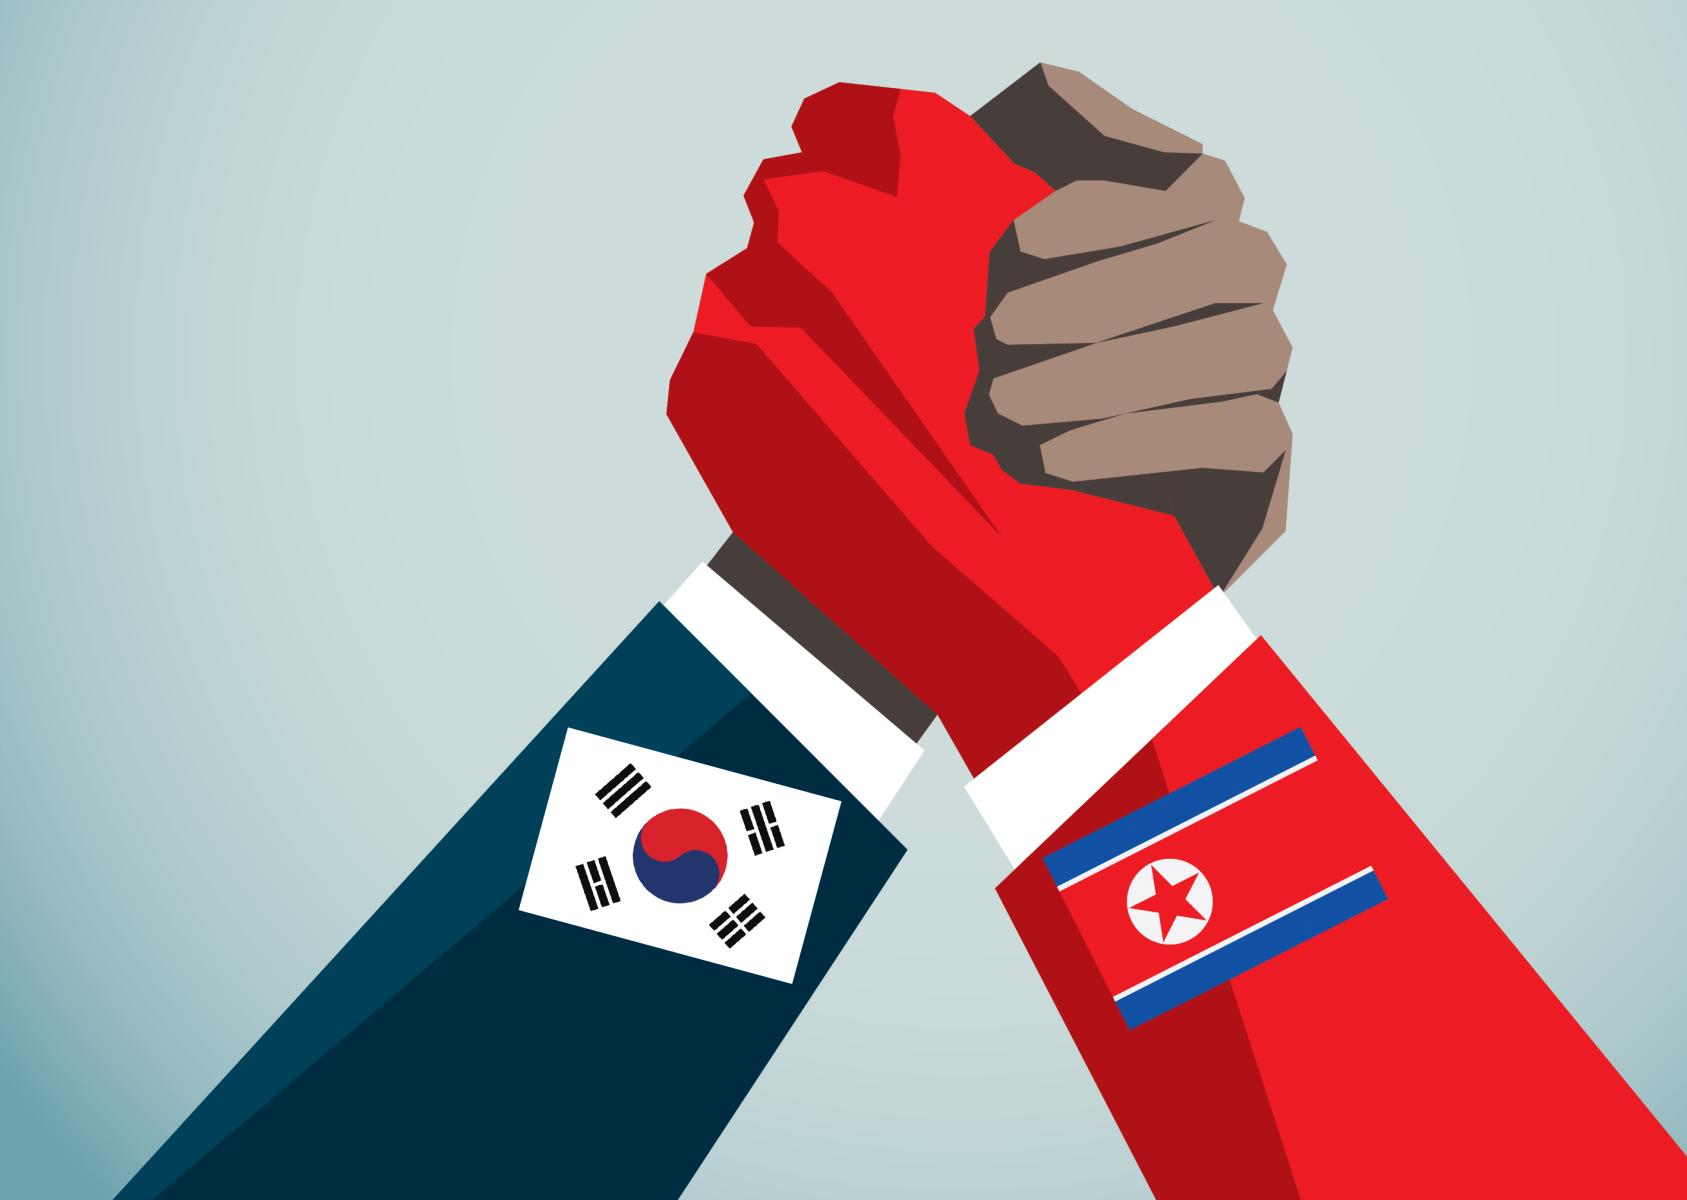 corea nord - corea sud